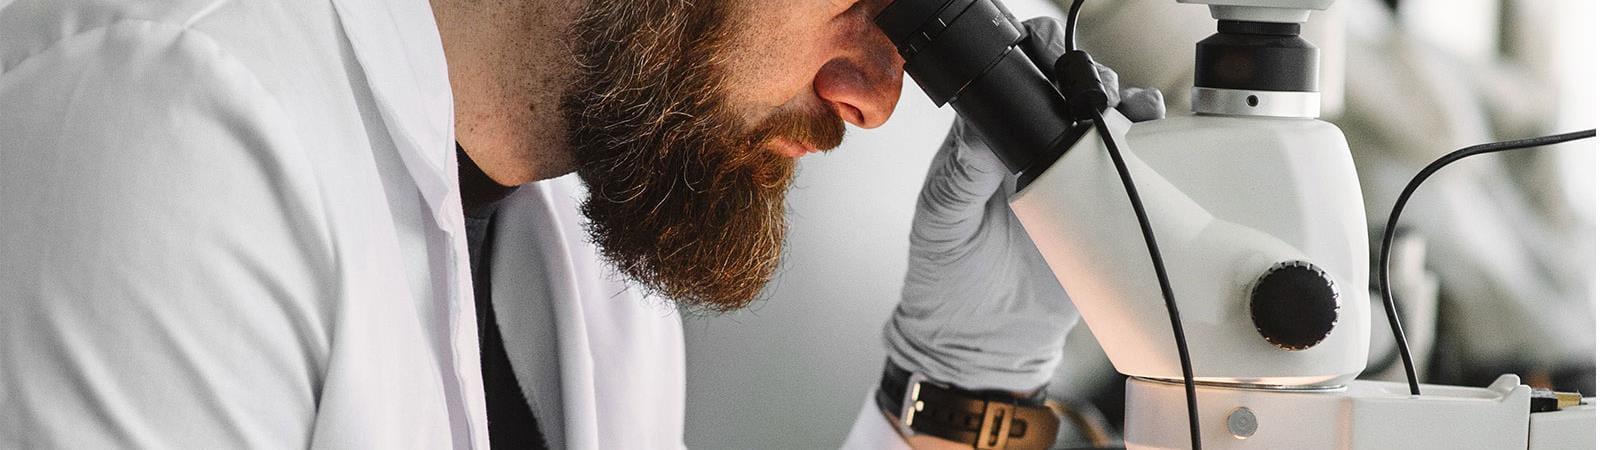 Homme regardant dans le microscope